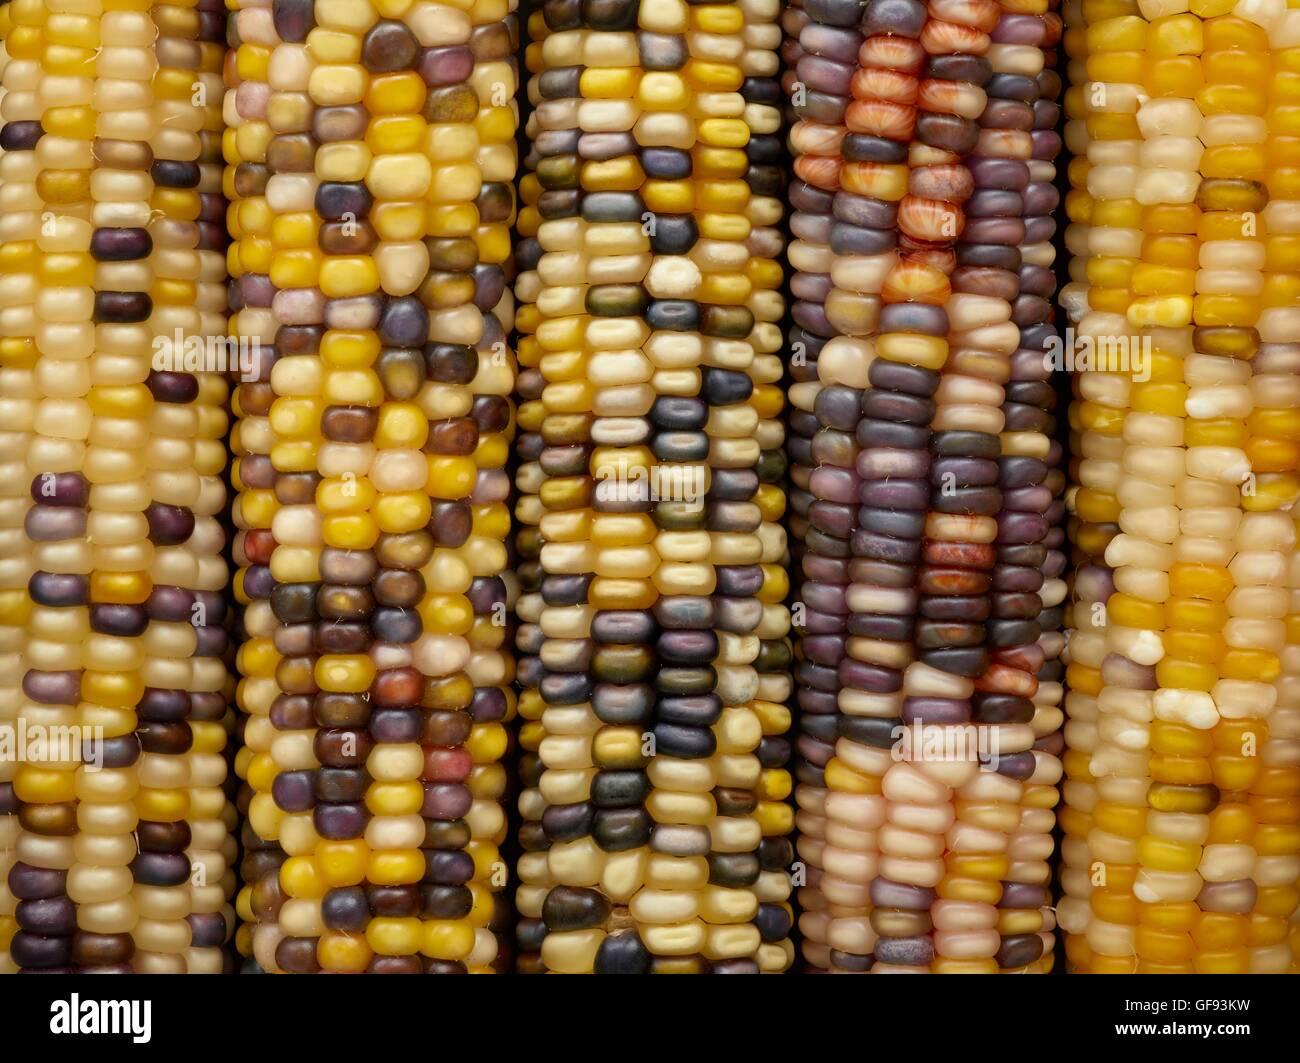 Flint corn, (Zea mays indurata), full frame. - Stock Image